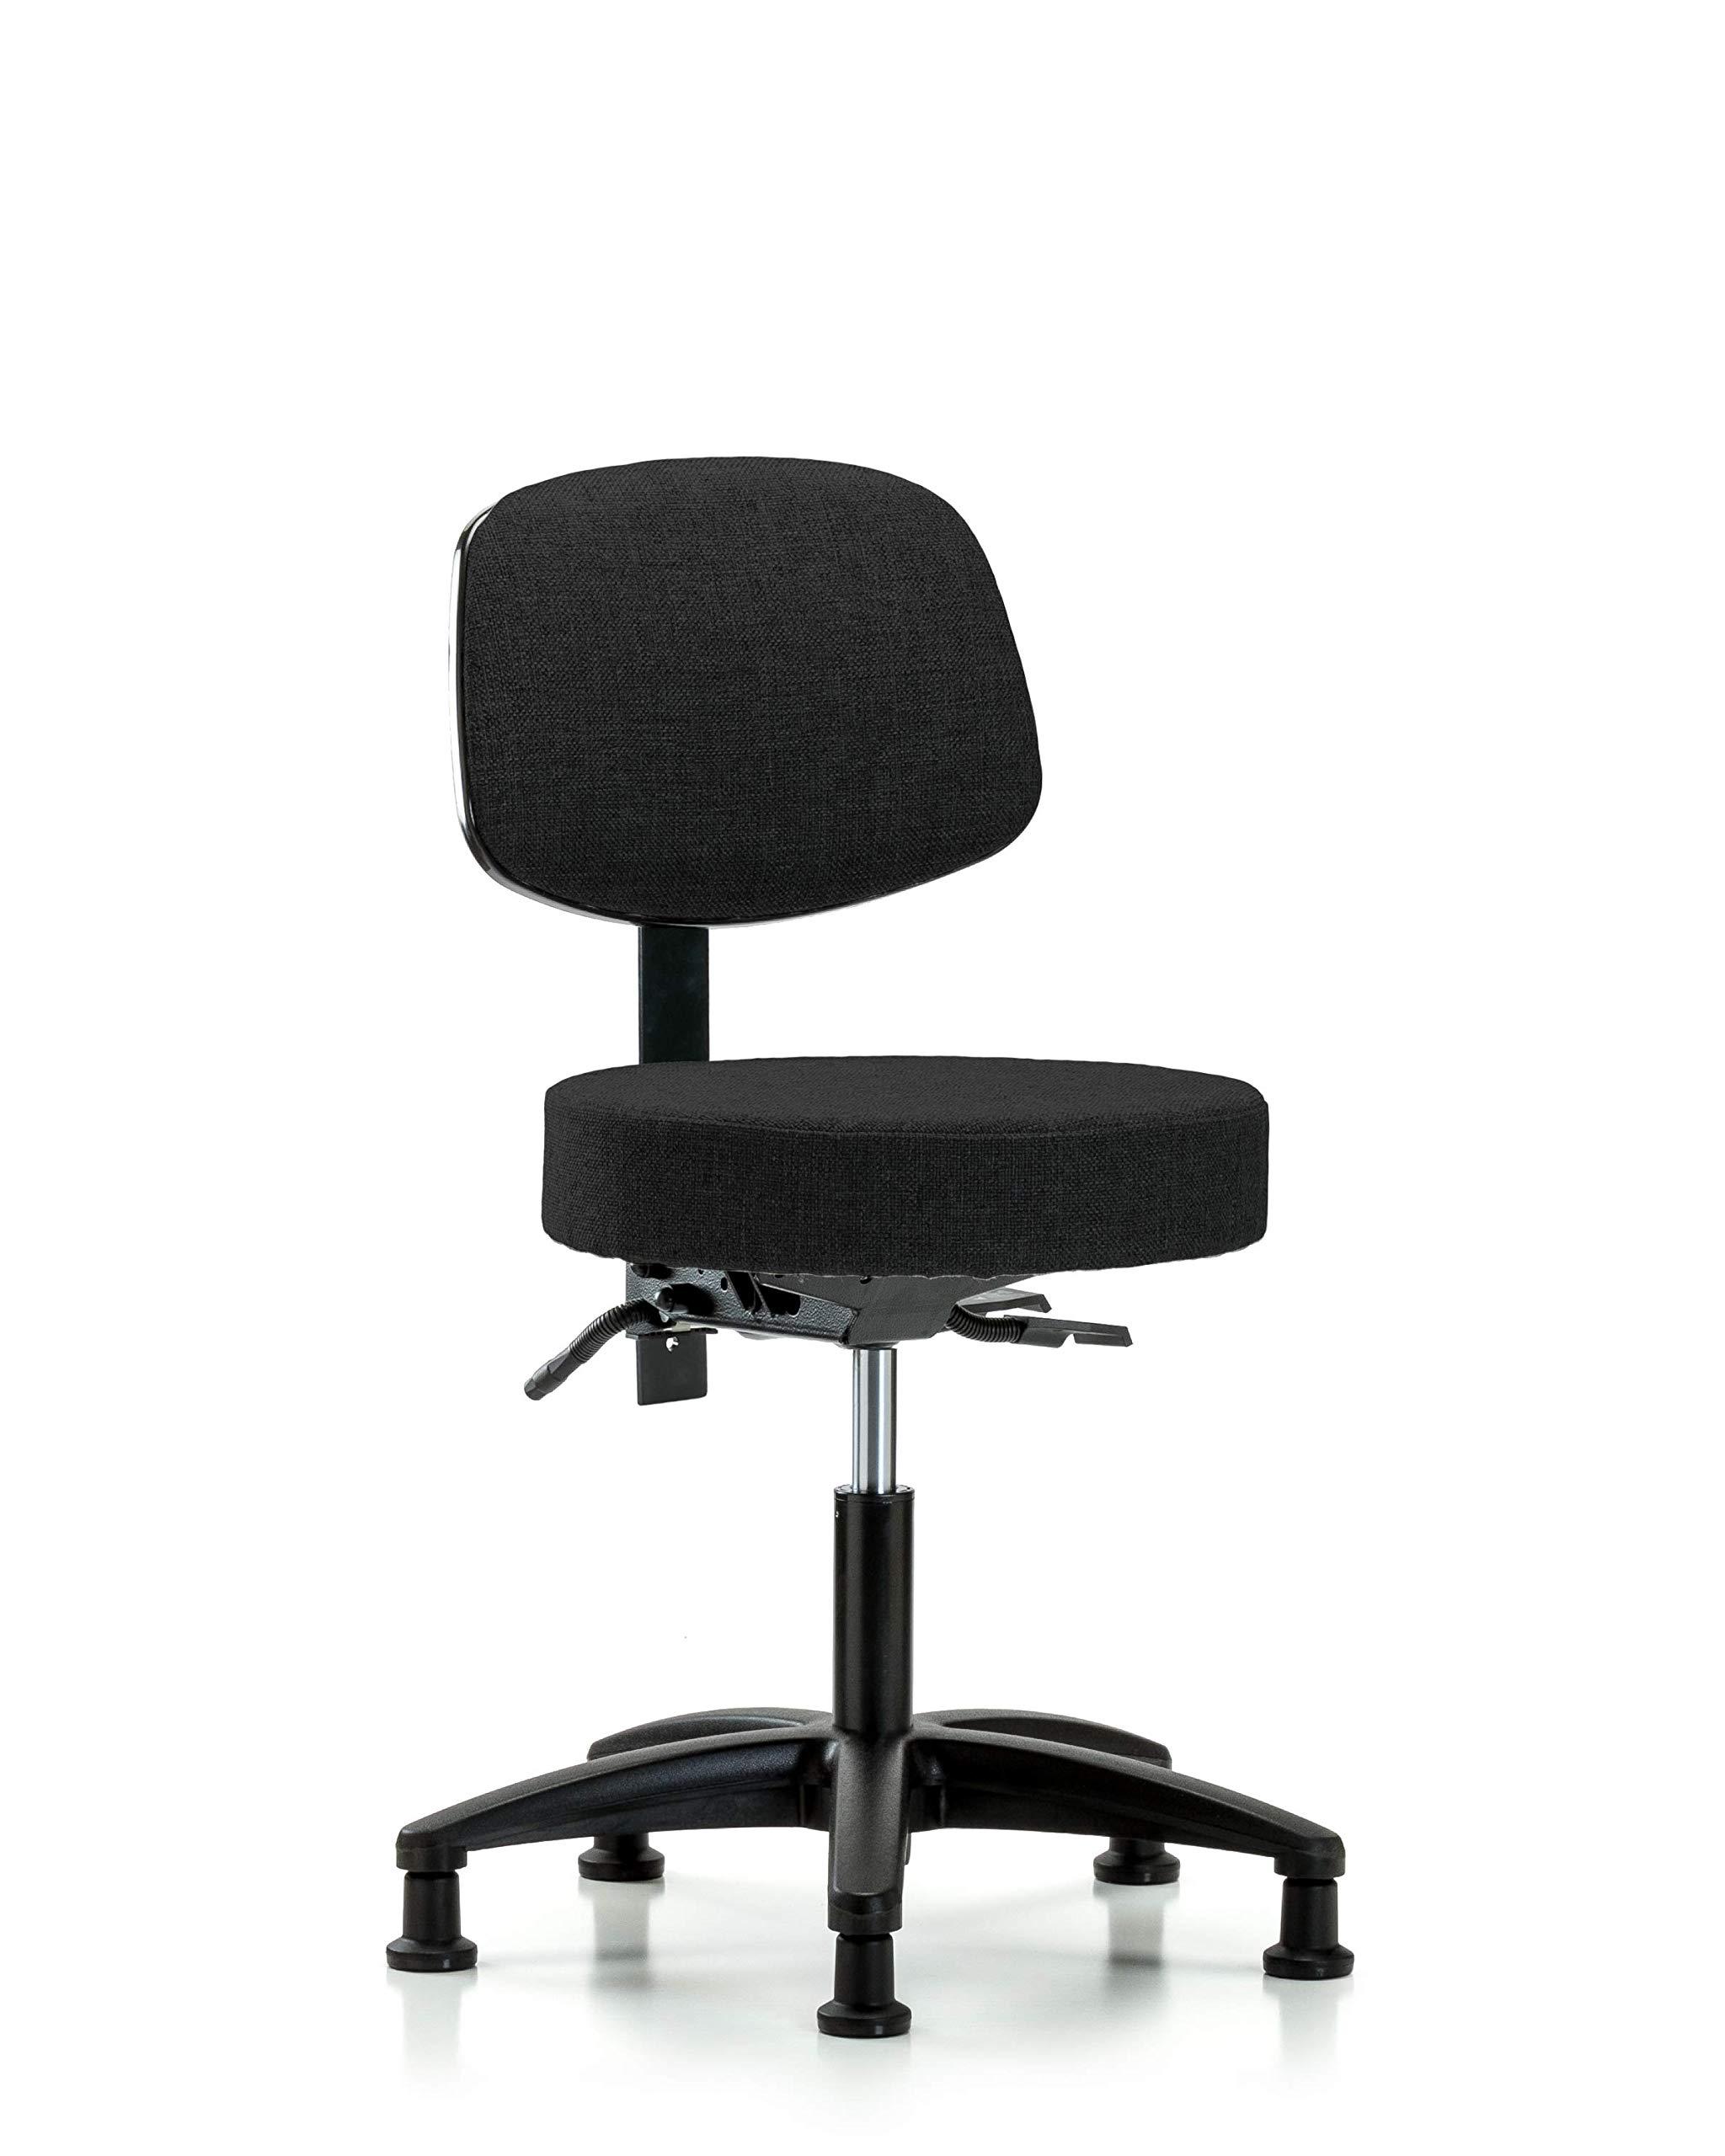 LabTech Seating LT41613 Fabric Desk Height Stool with Back Nylon Base, Tilt, Glides, Black